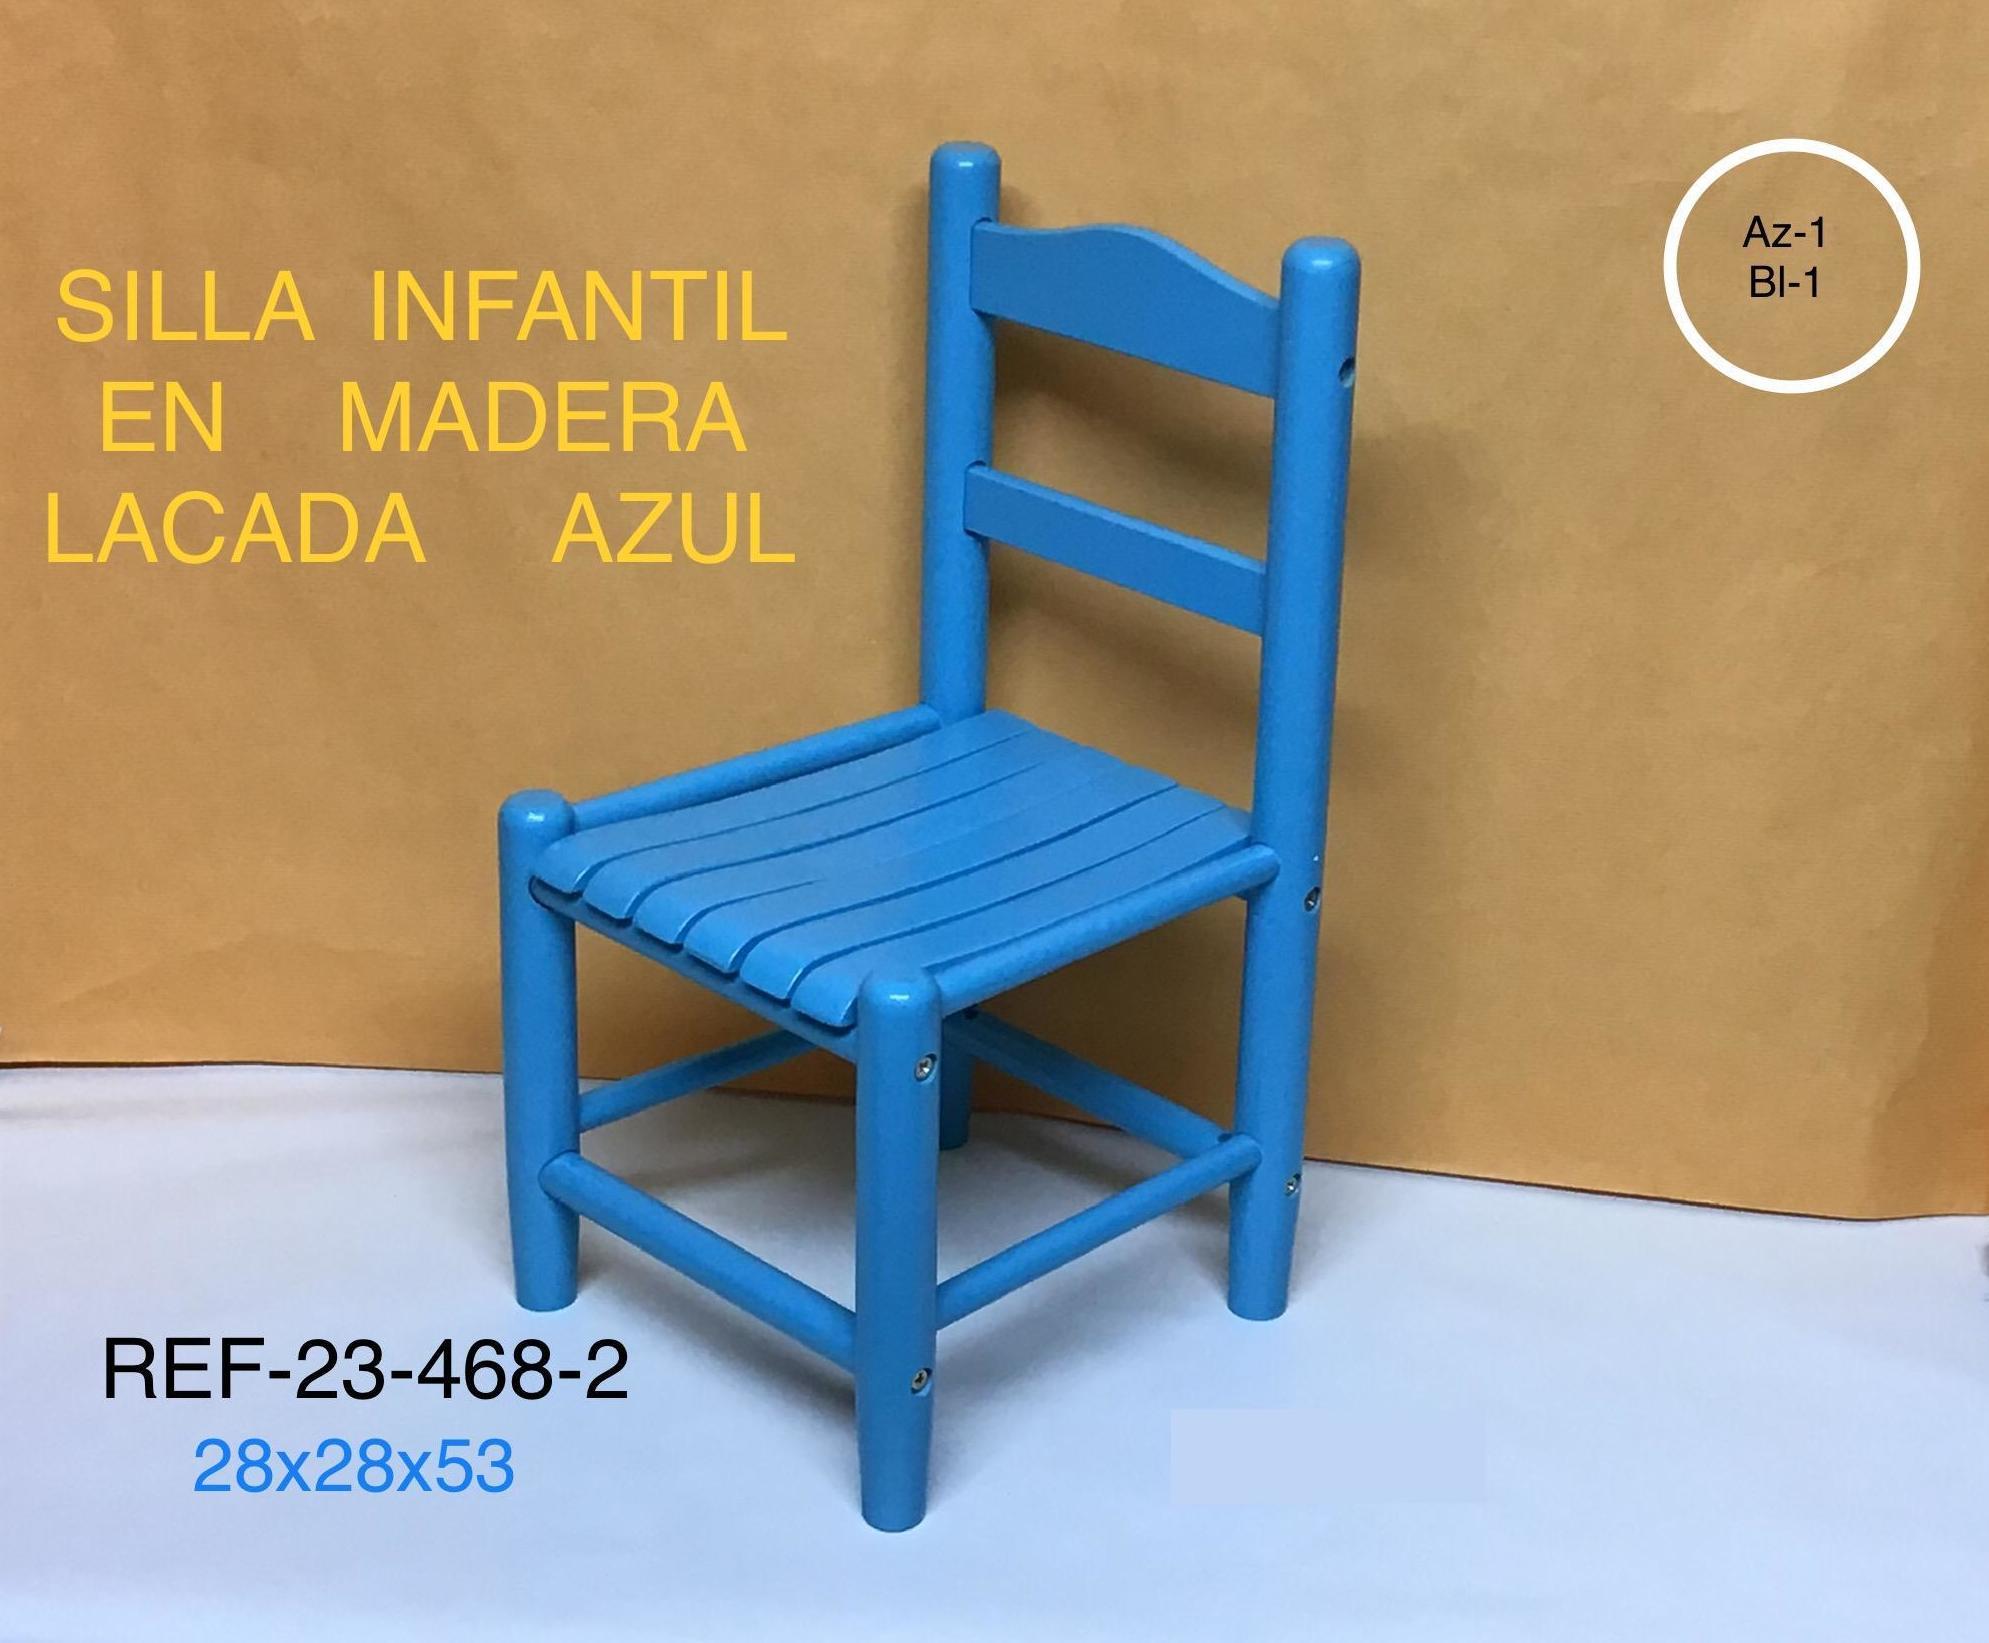 SILLA INFANTIL MADERA AZUL 28X28X54